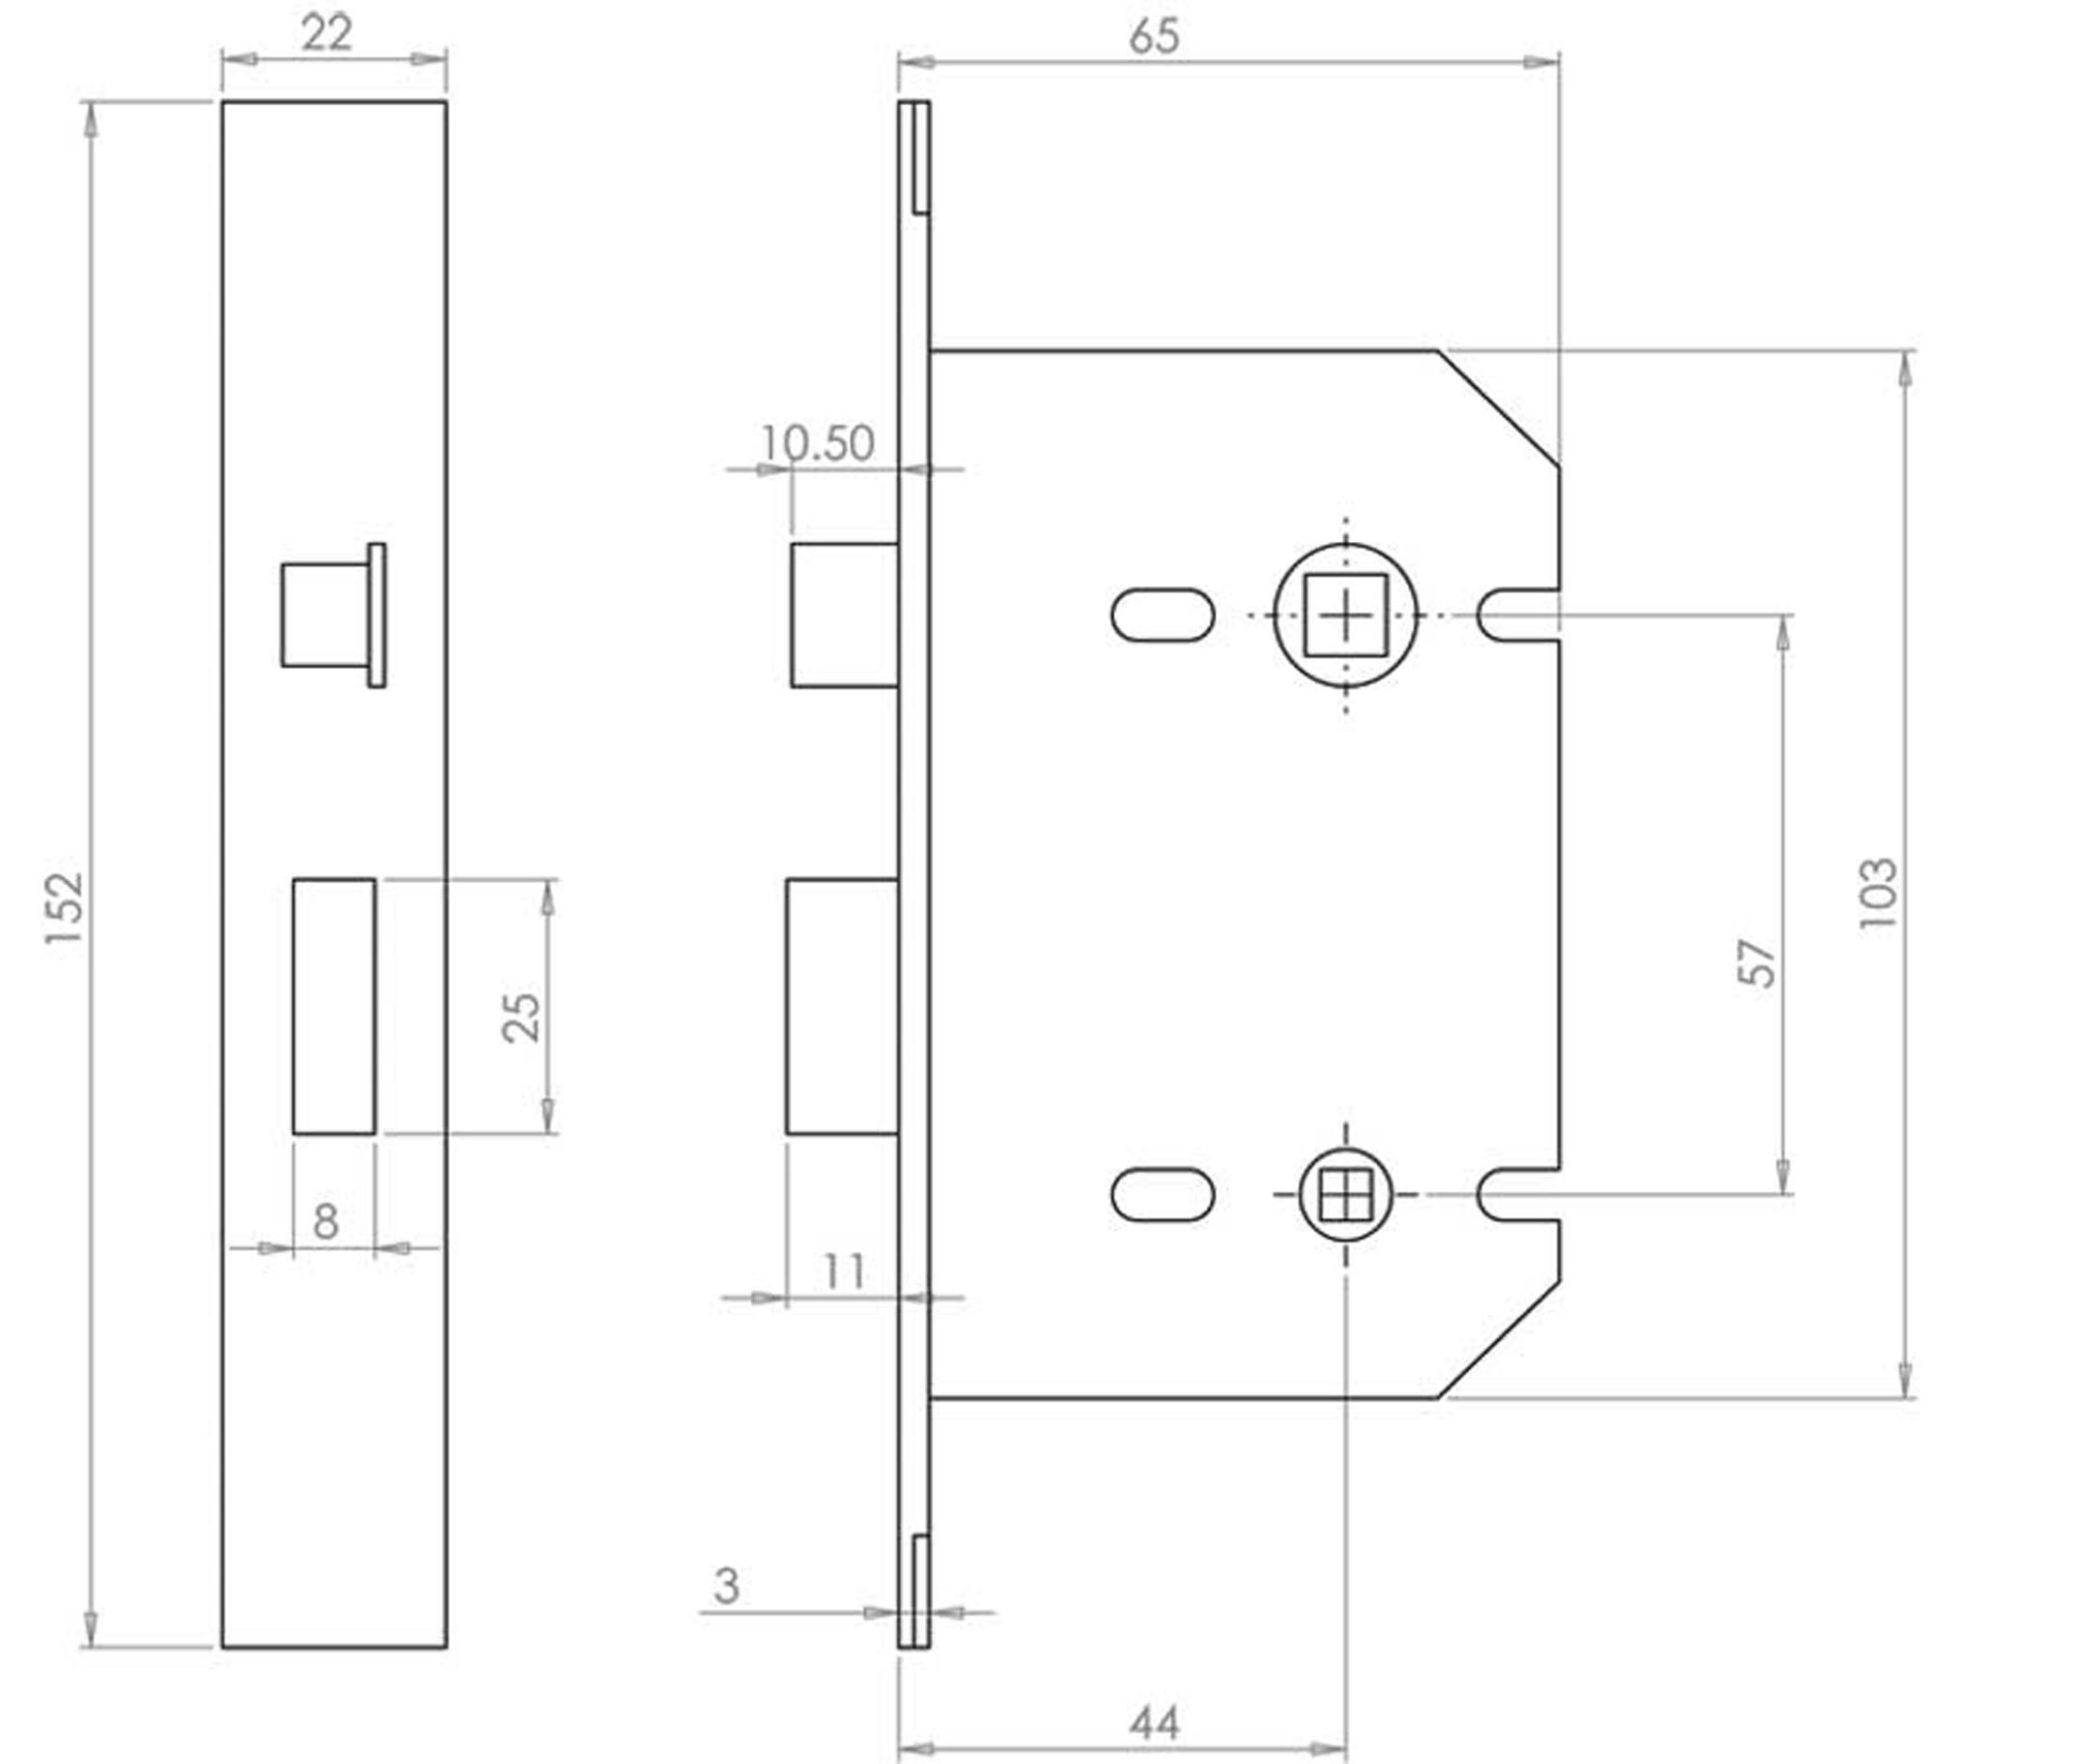 Mat Black Reversible 3 Lever Sash Or Mortise Lock 63mm 2 1 Diagram Description